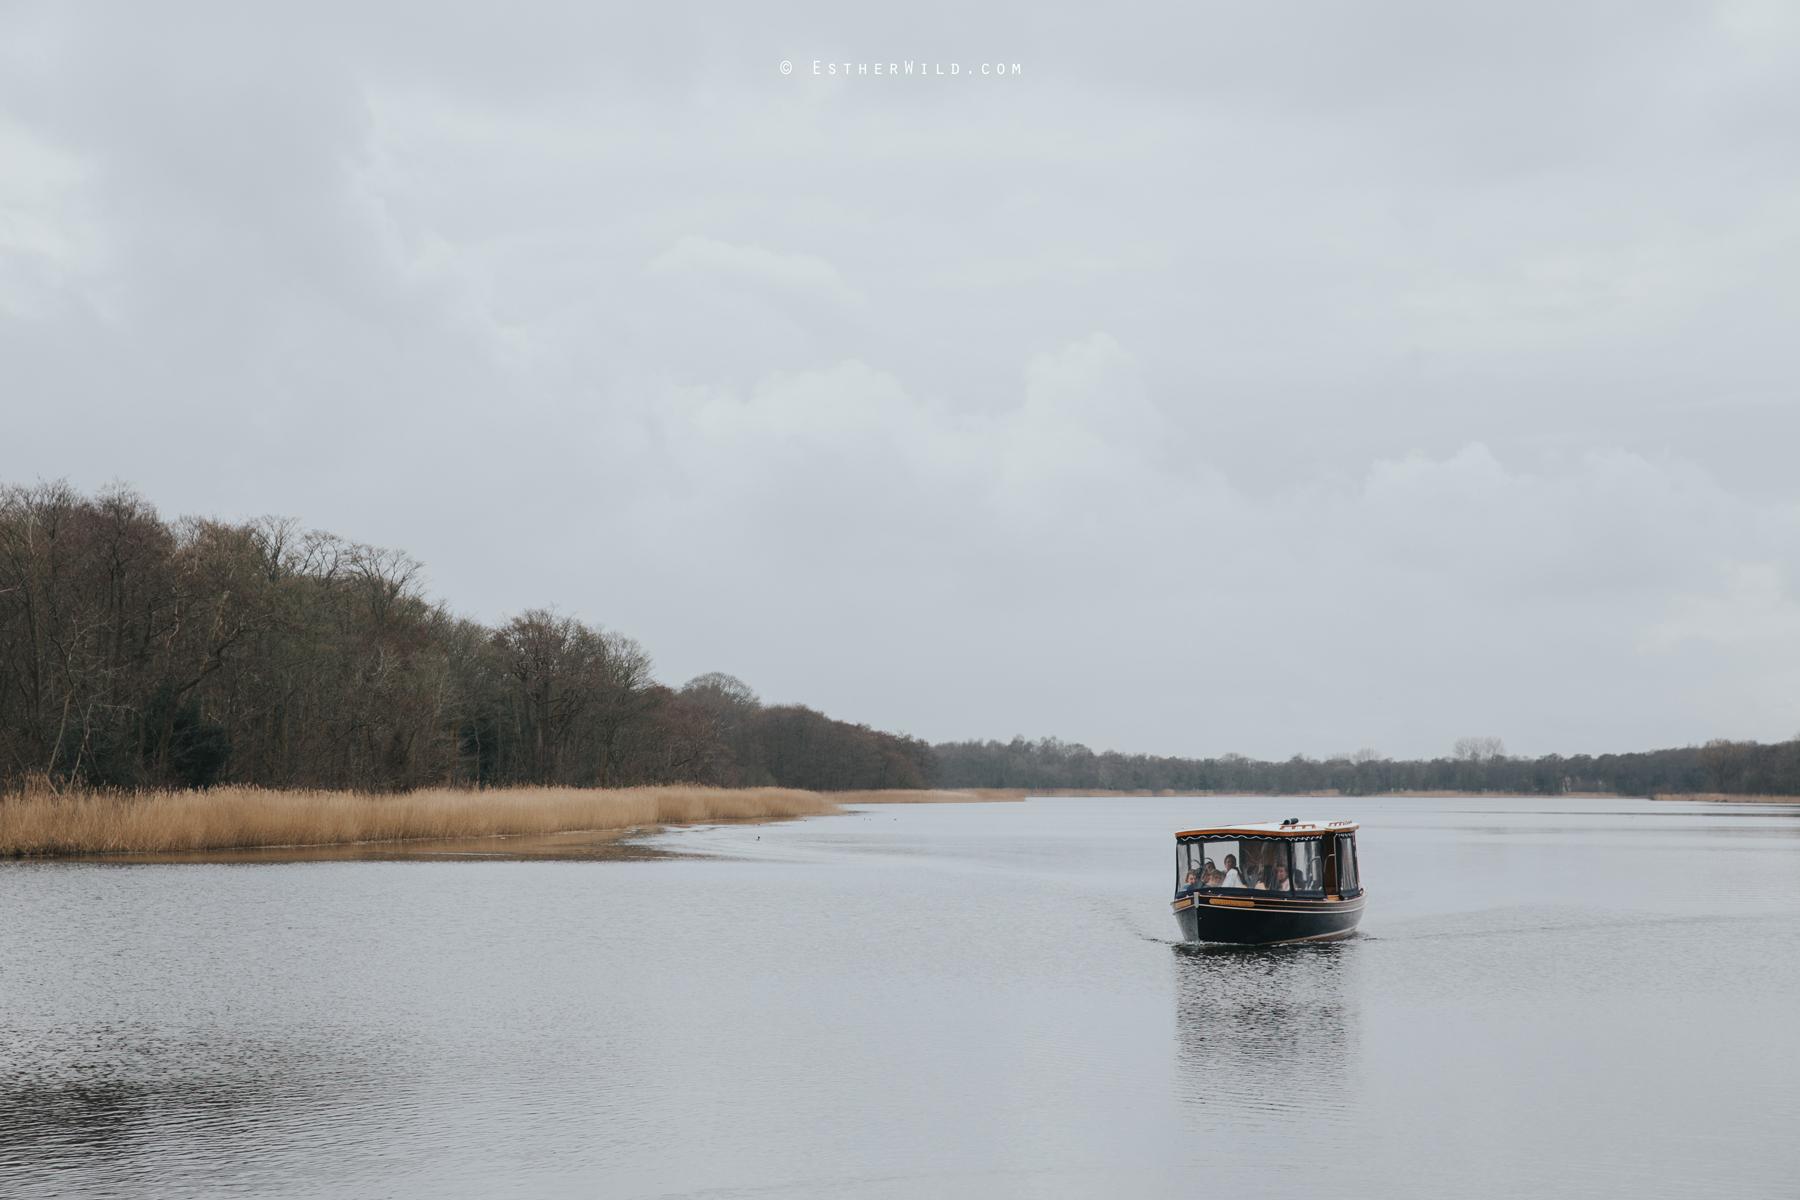 The_BoatHouse_Wedding_Venue_Ormesby_Norfolk_Broads_Boat_Wedding_Photography_Esther_Wild_Photographer_IMG_0900.jpg